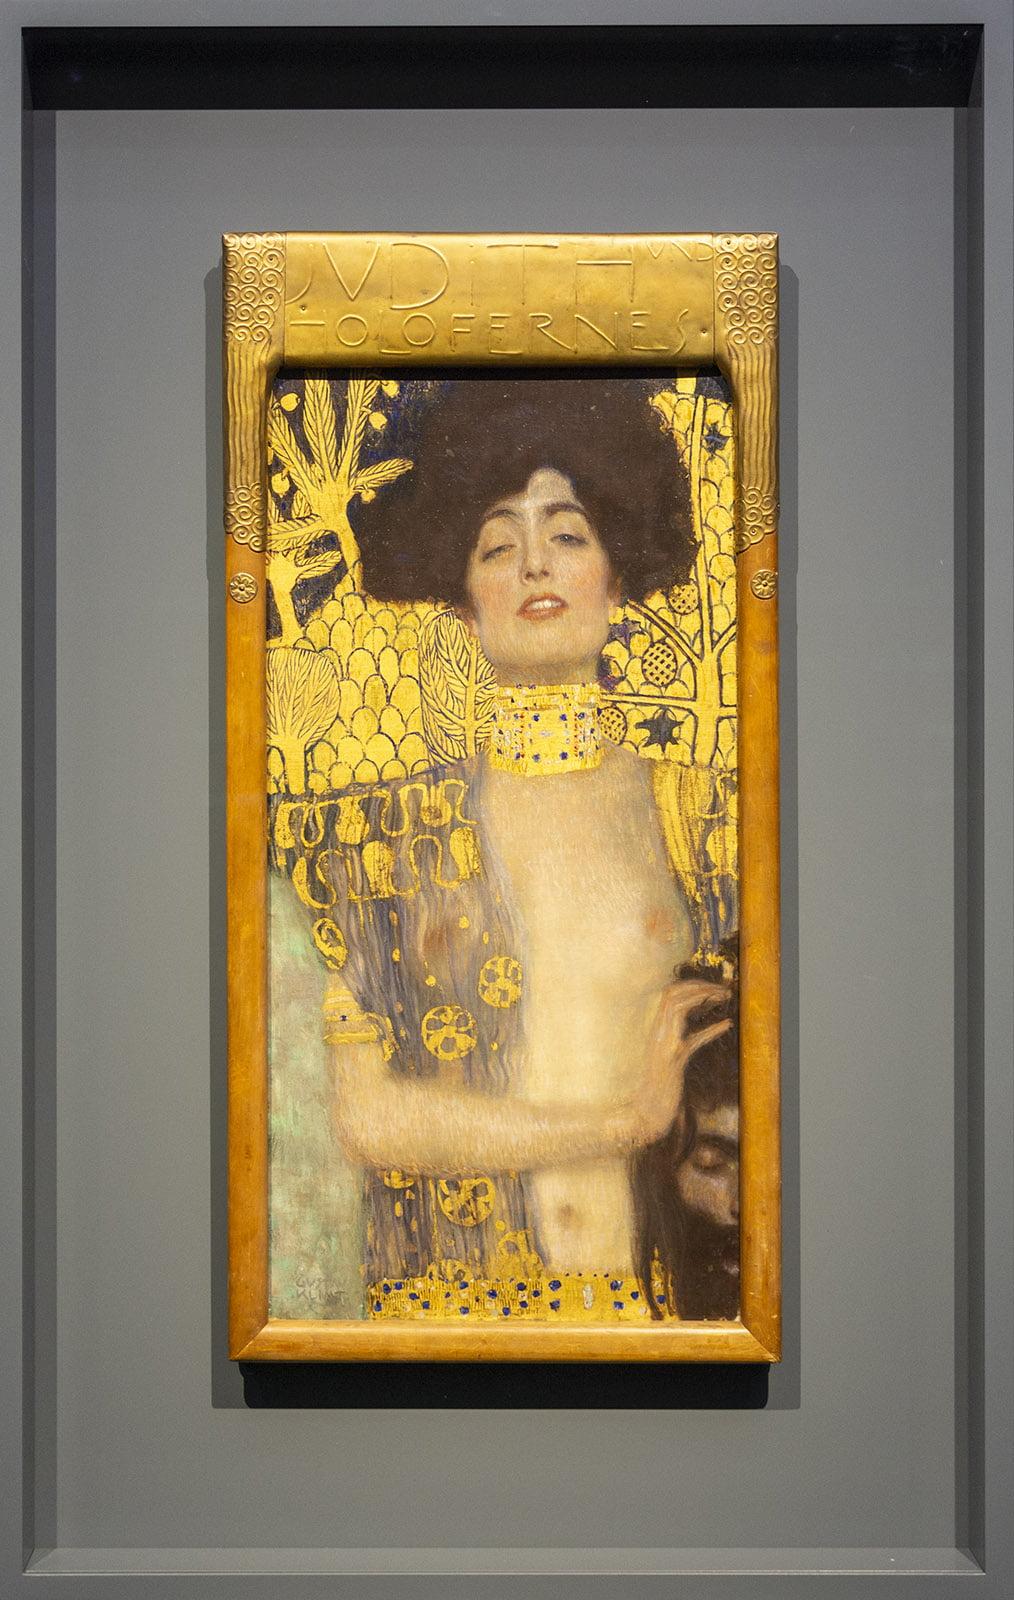 Kunstmuseum, Den Haag, Judith, Klimt